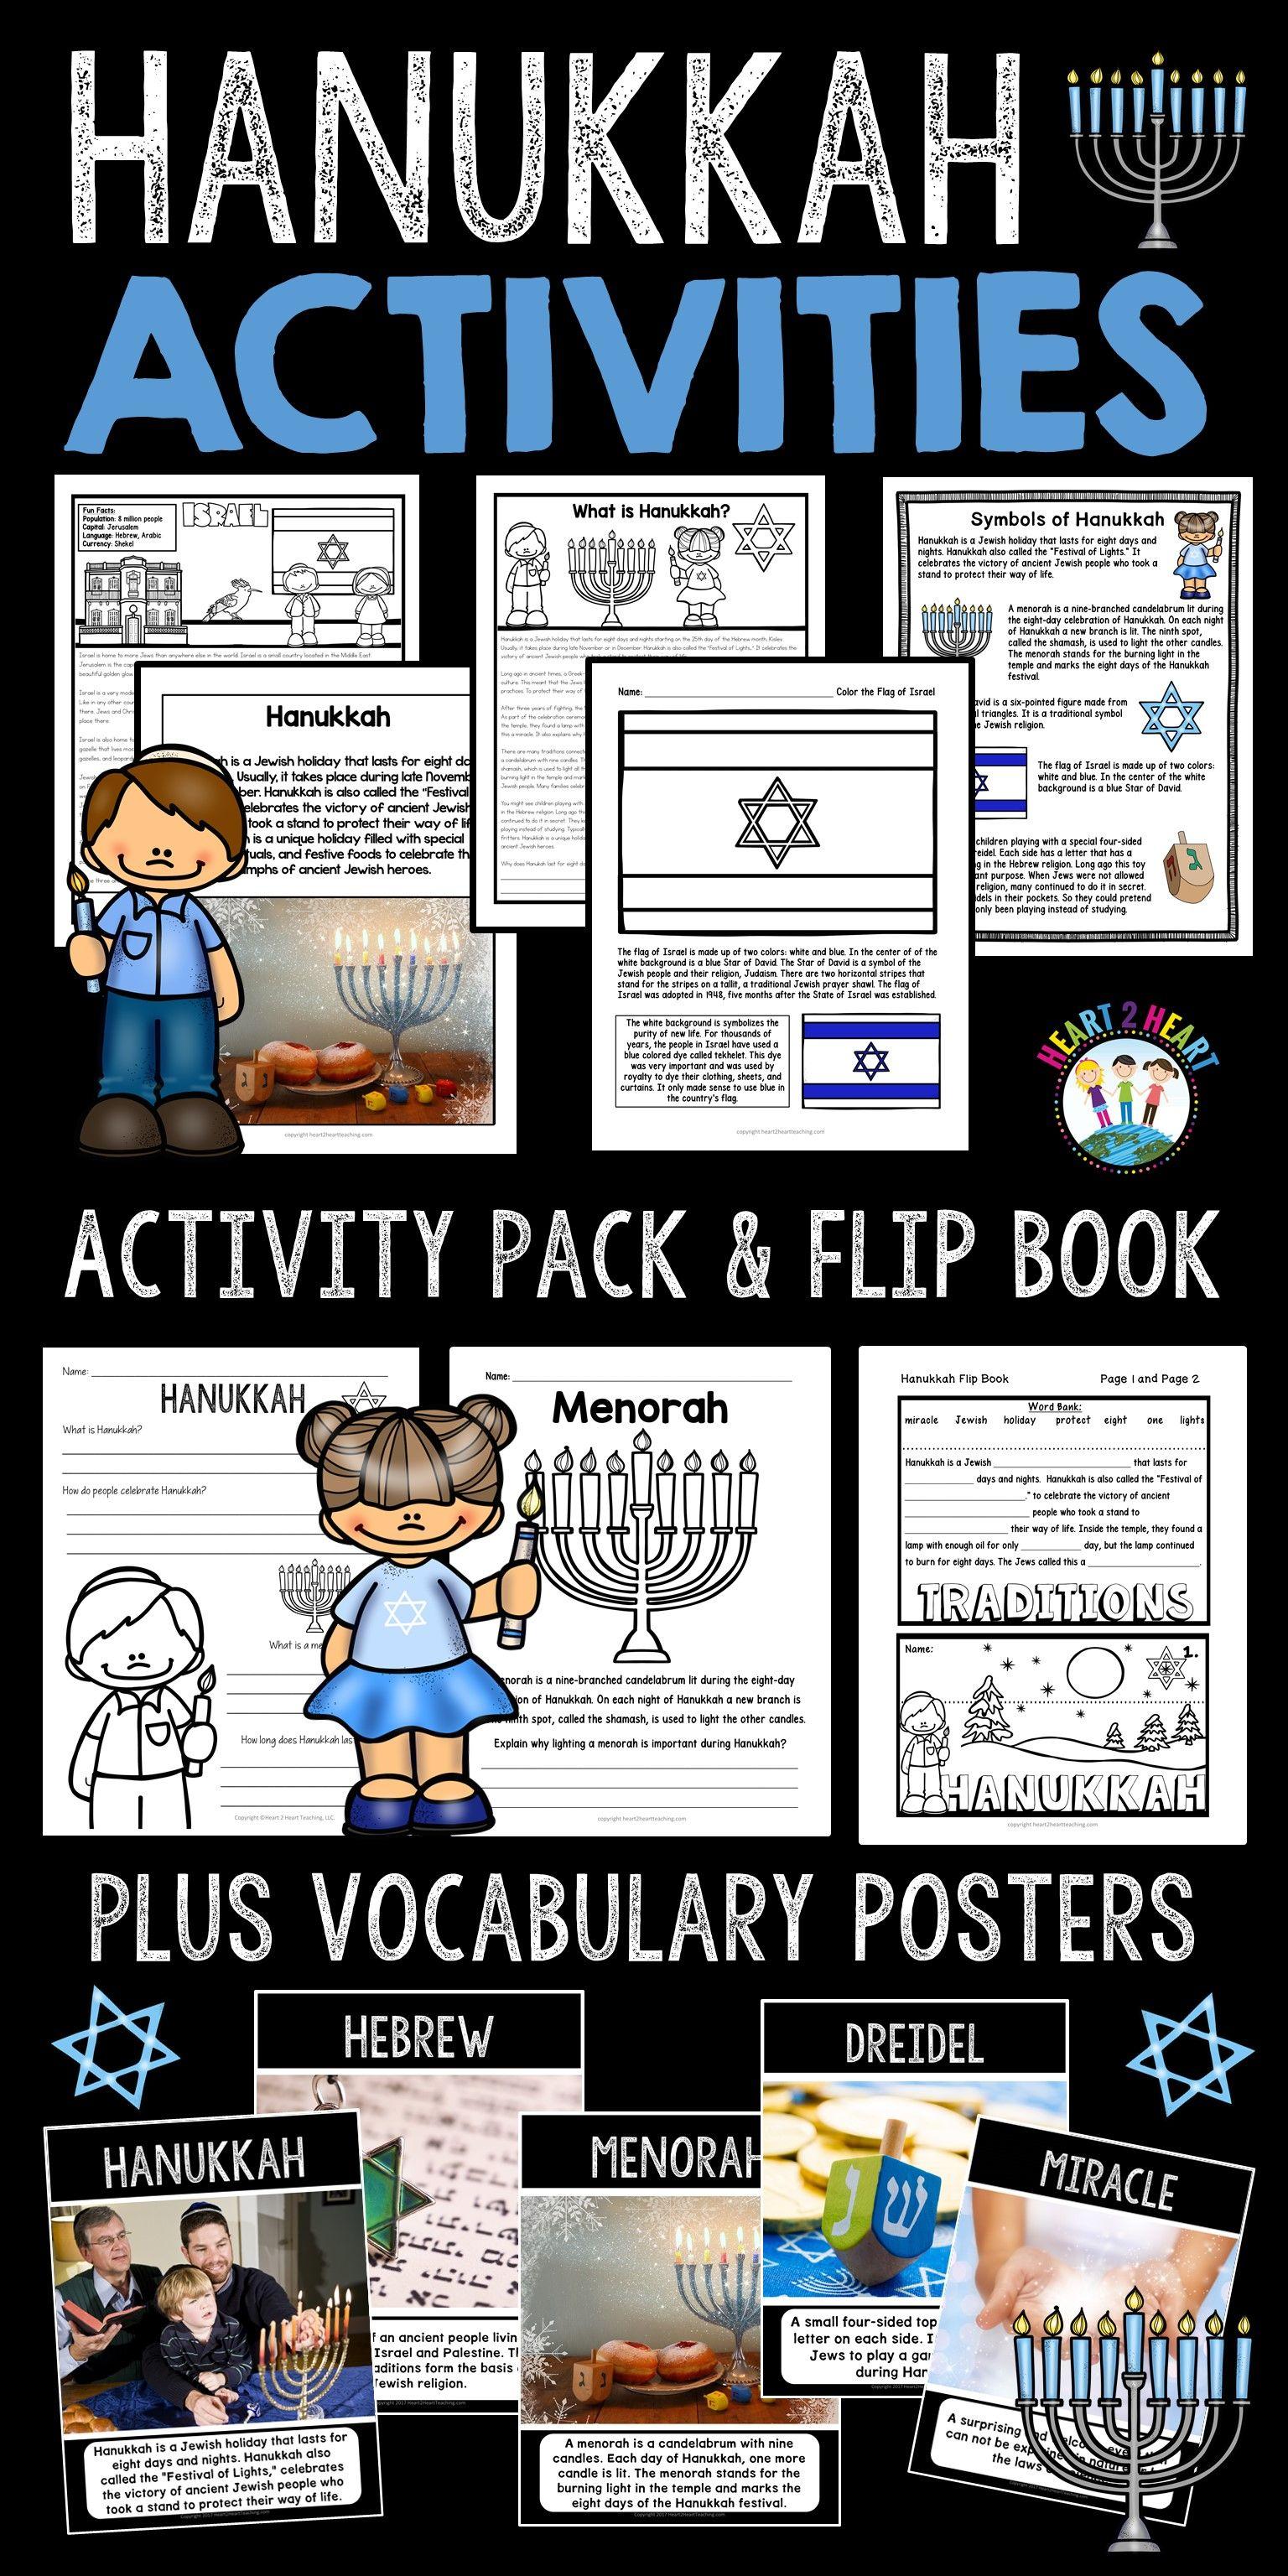 Hanukkah Activity Pack With Articles Activities Amp Flip Book